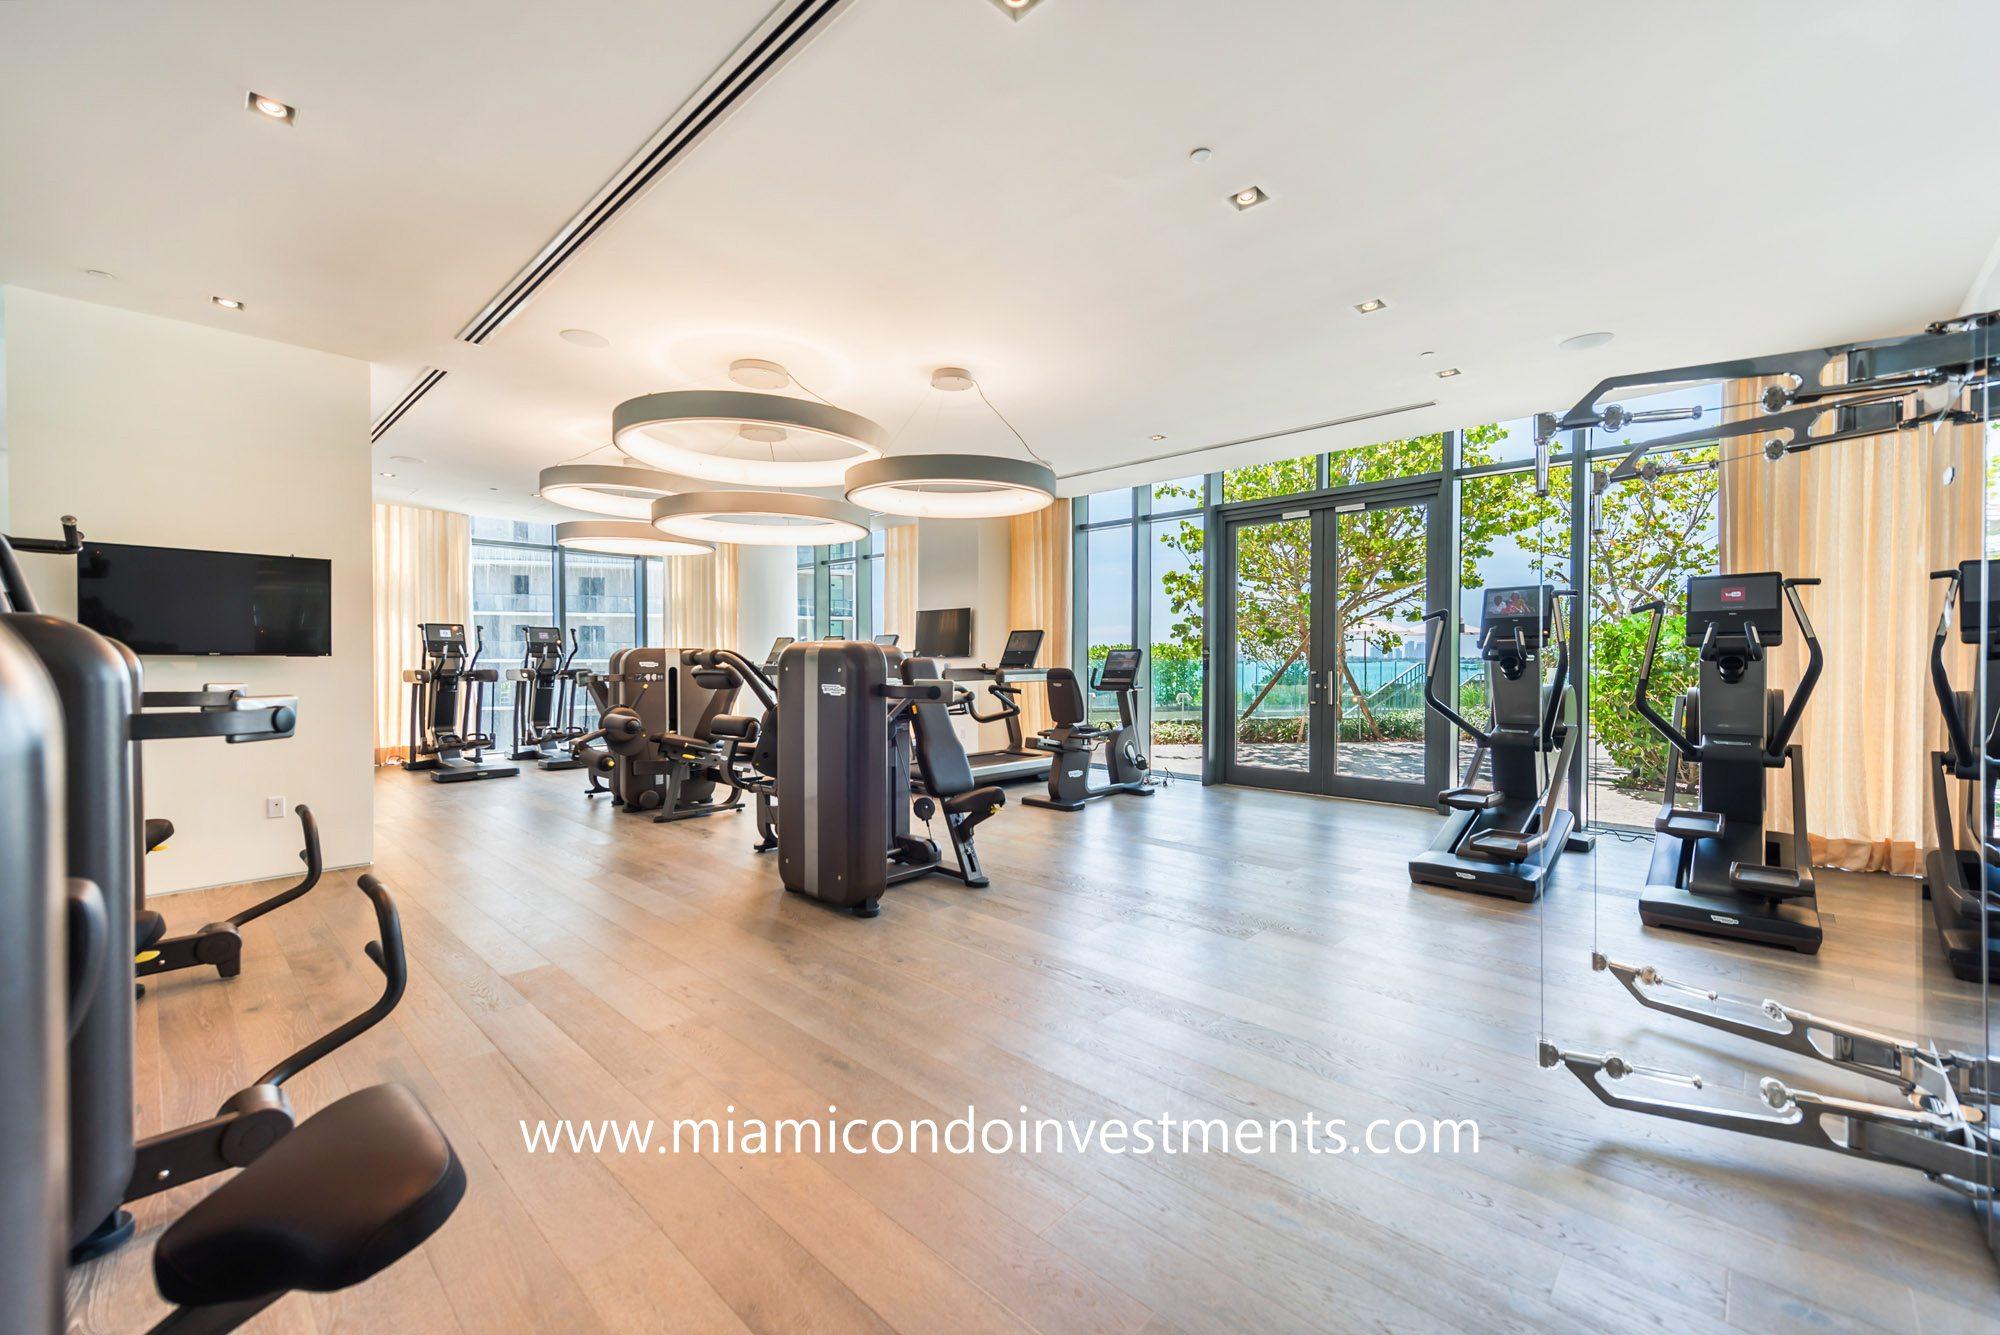 Paraiso Bay fitness center